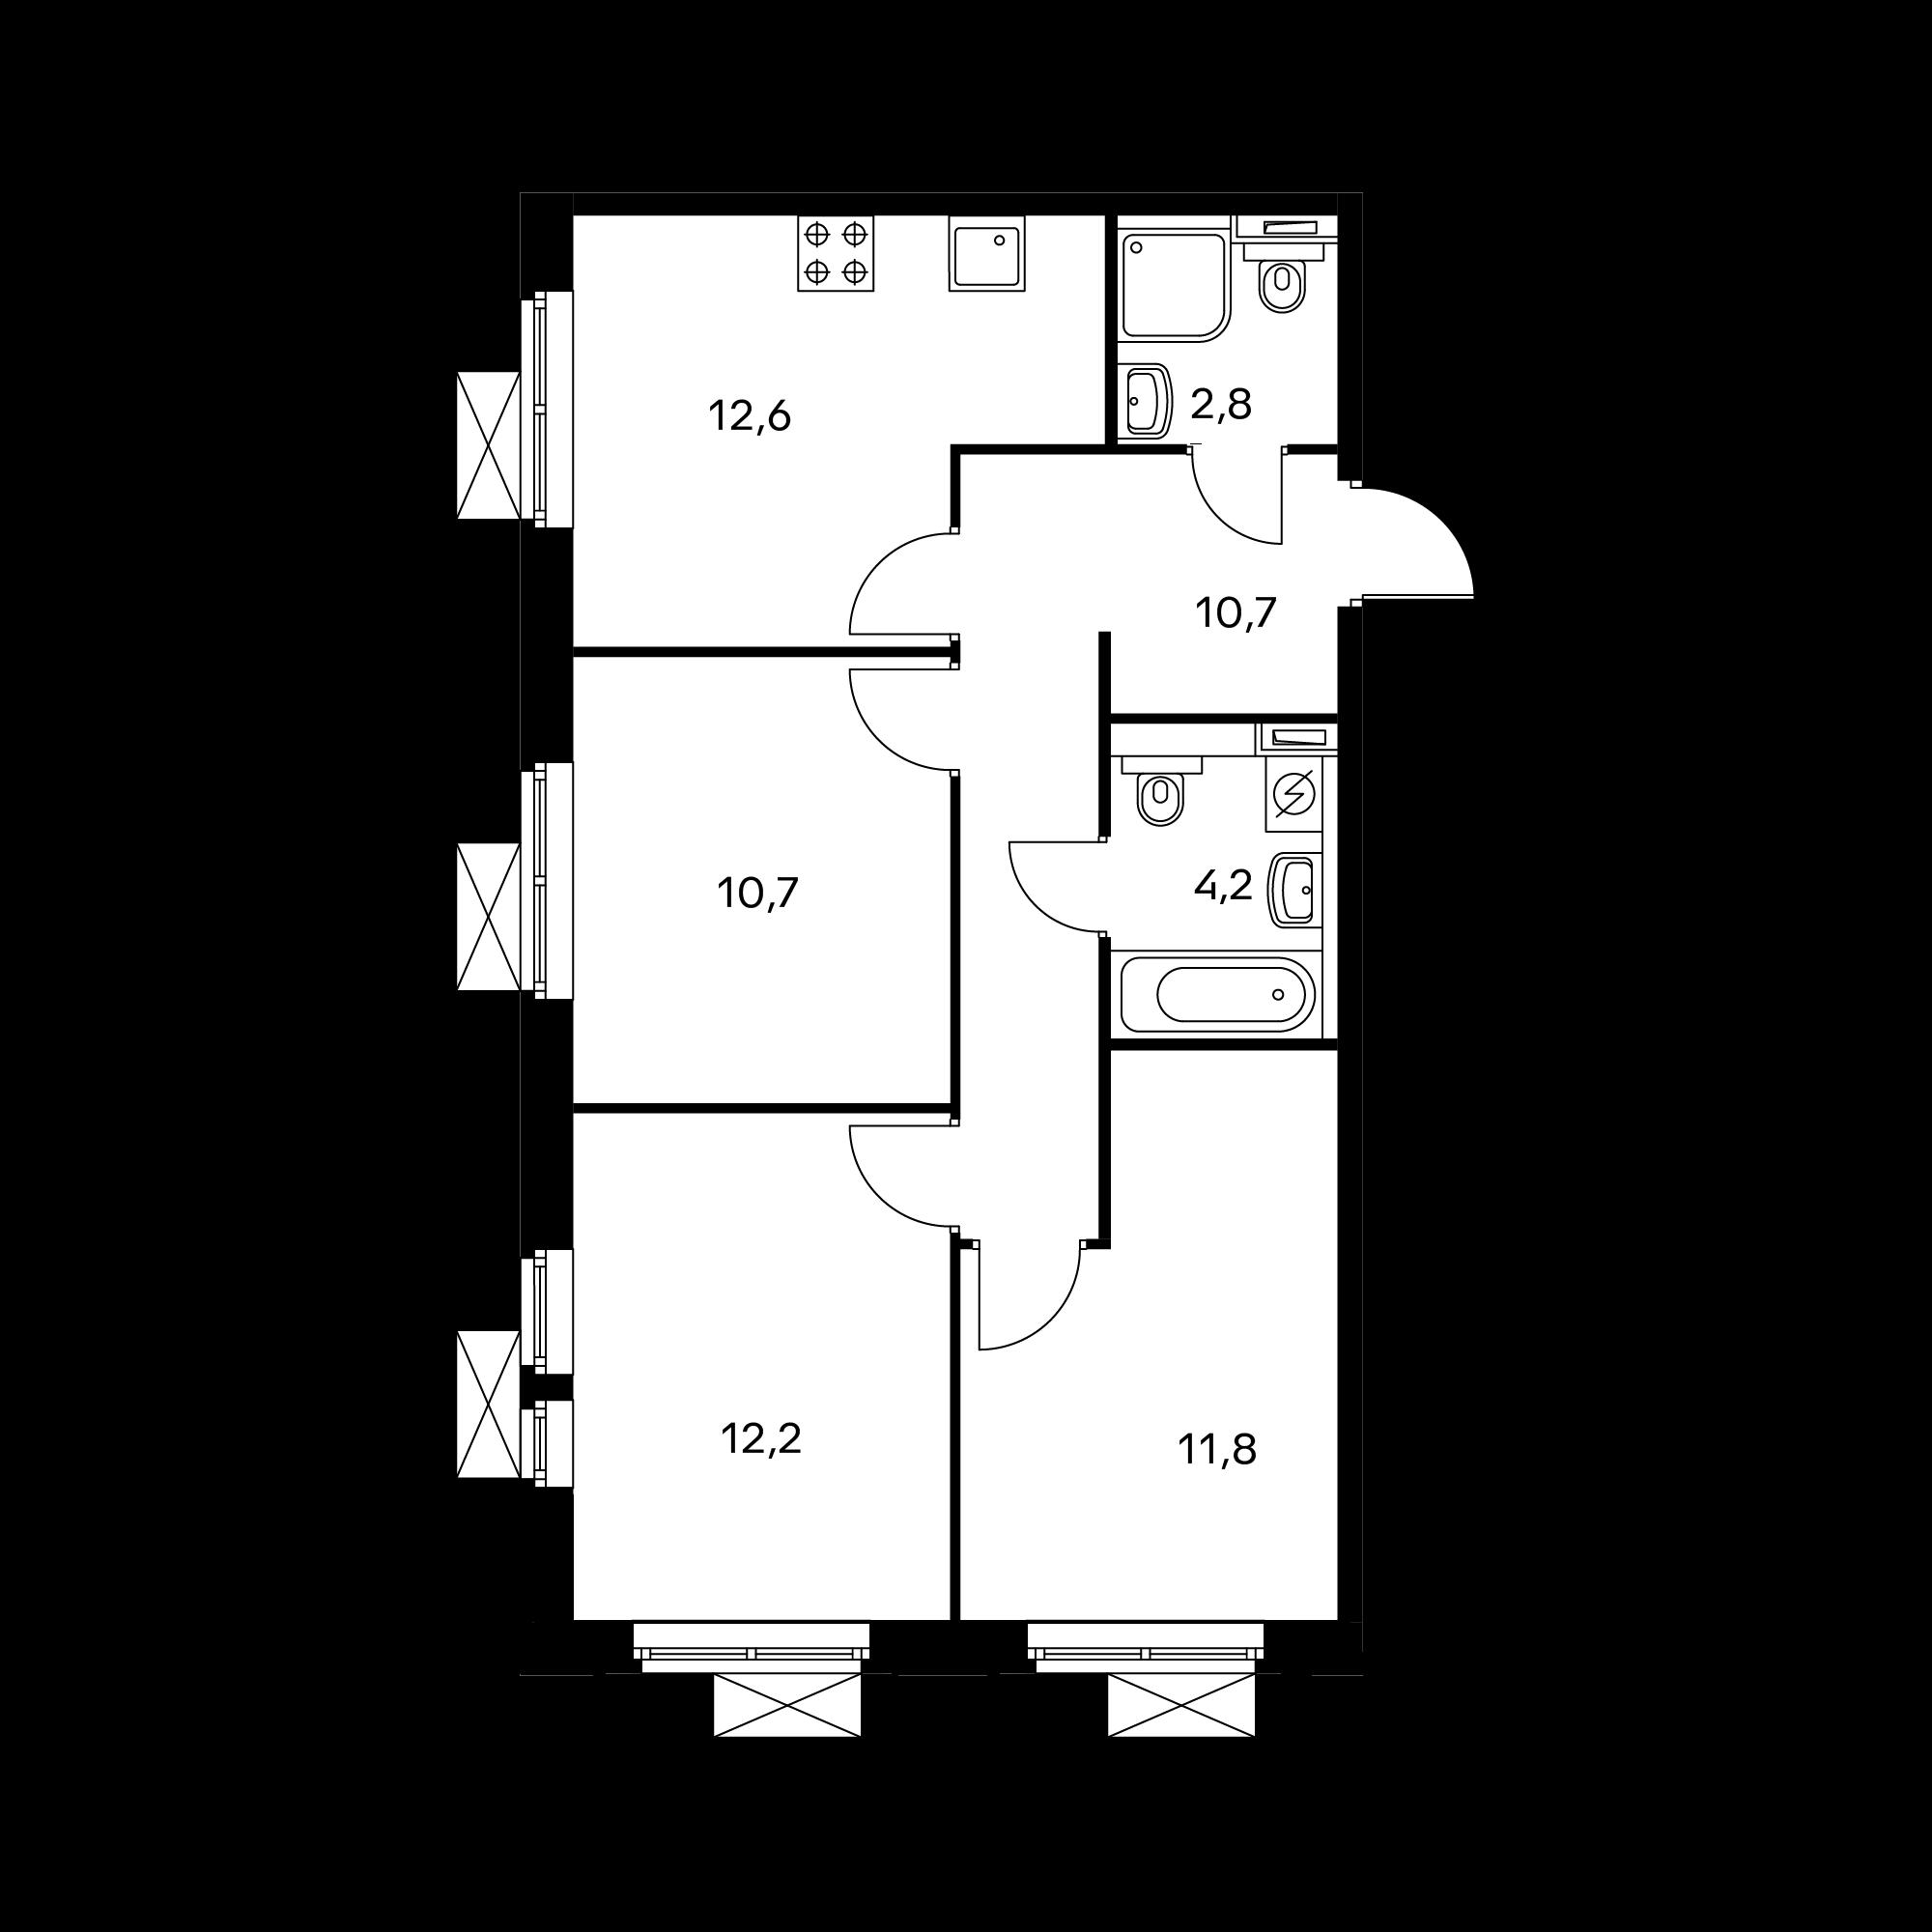 3KS9_6.6-1_1